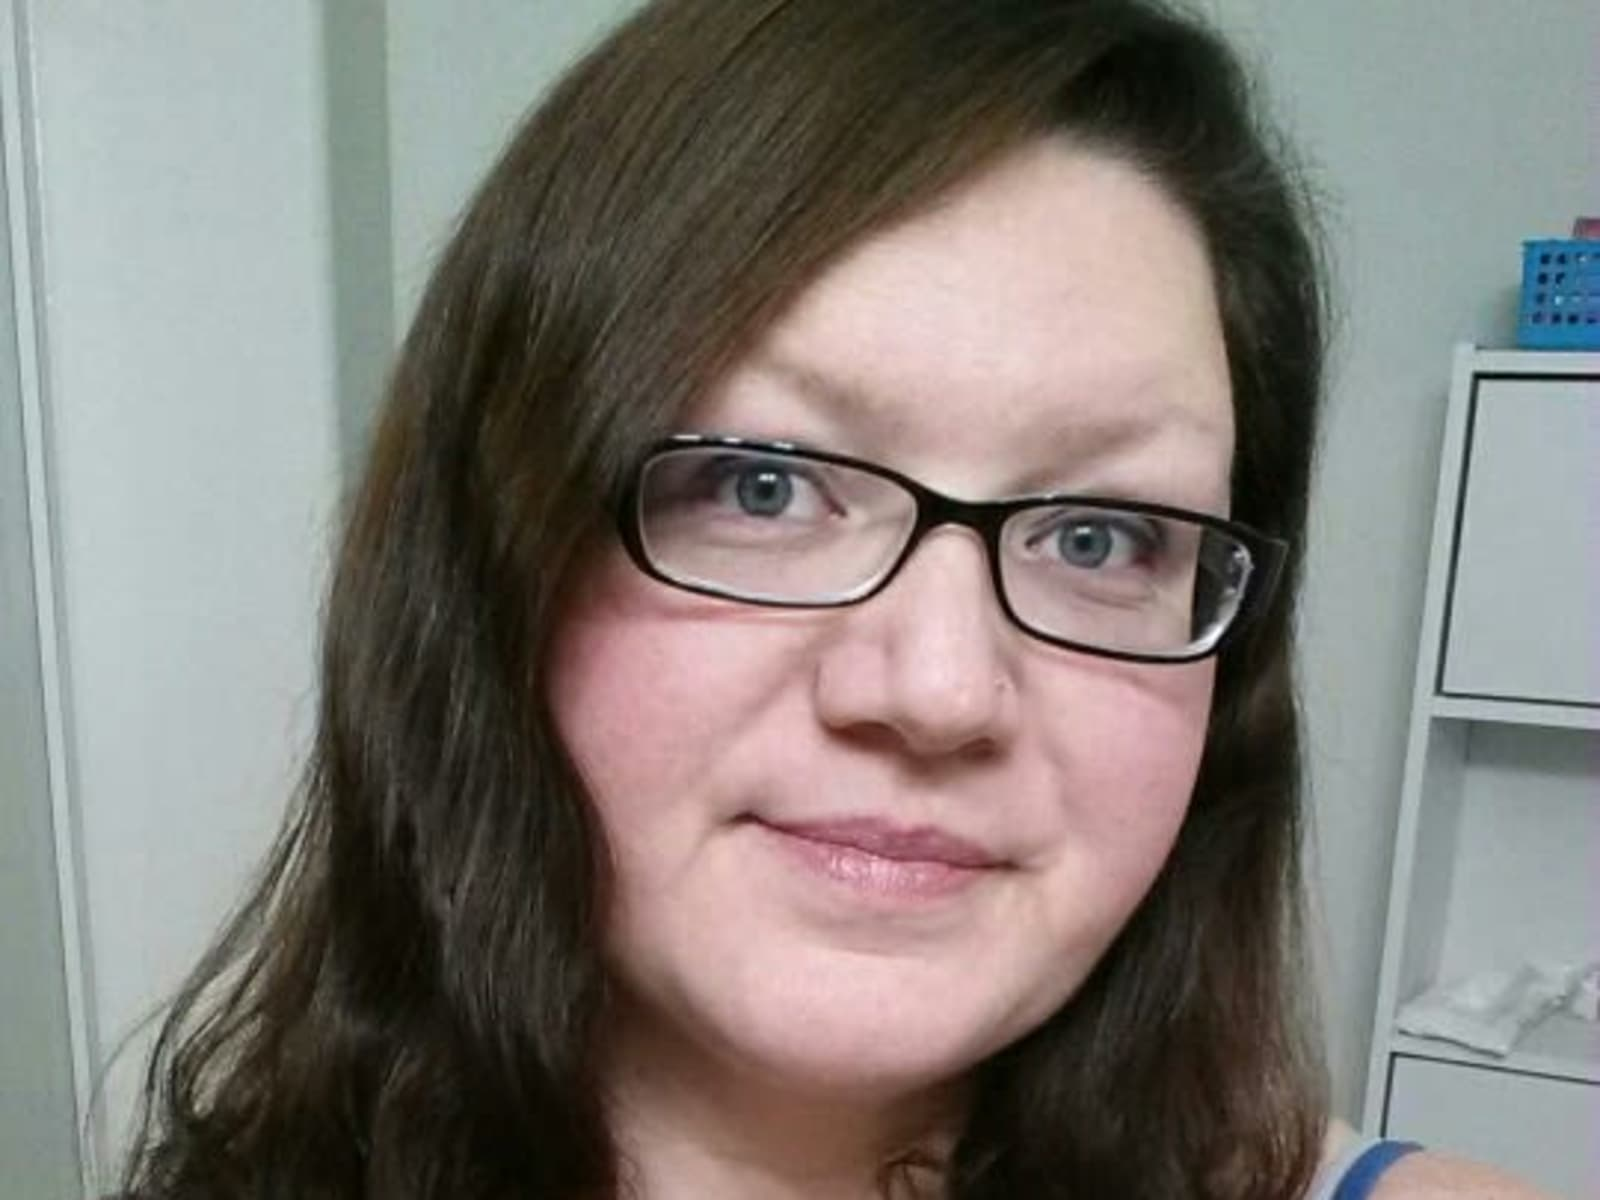 Charmaine from Calgary, Alberta, Canada